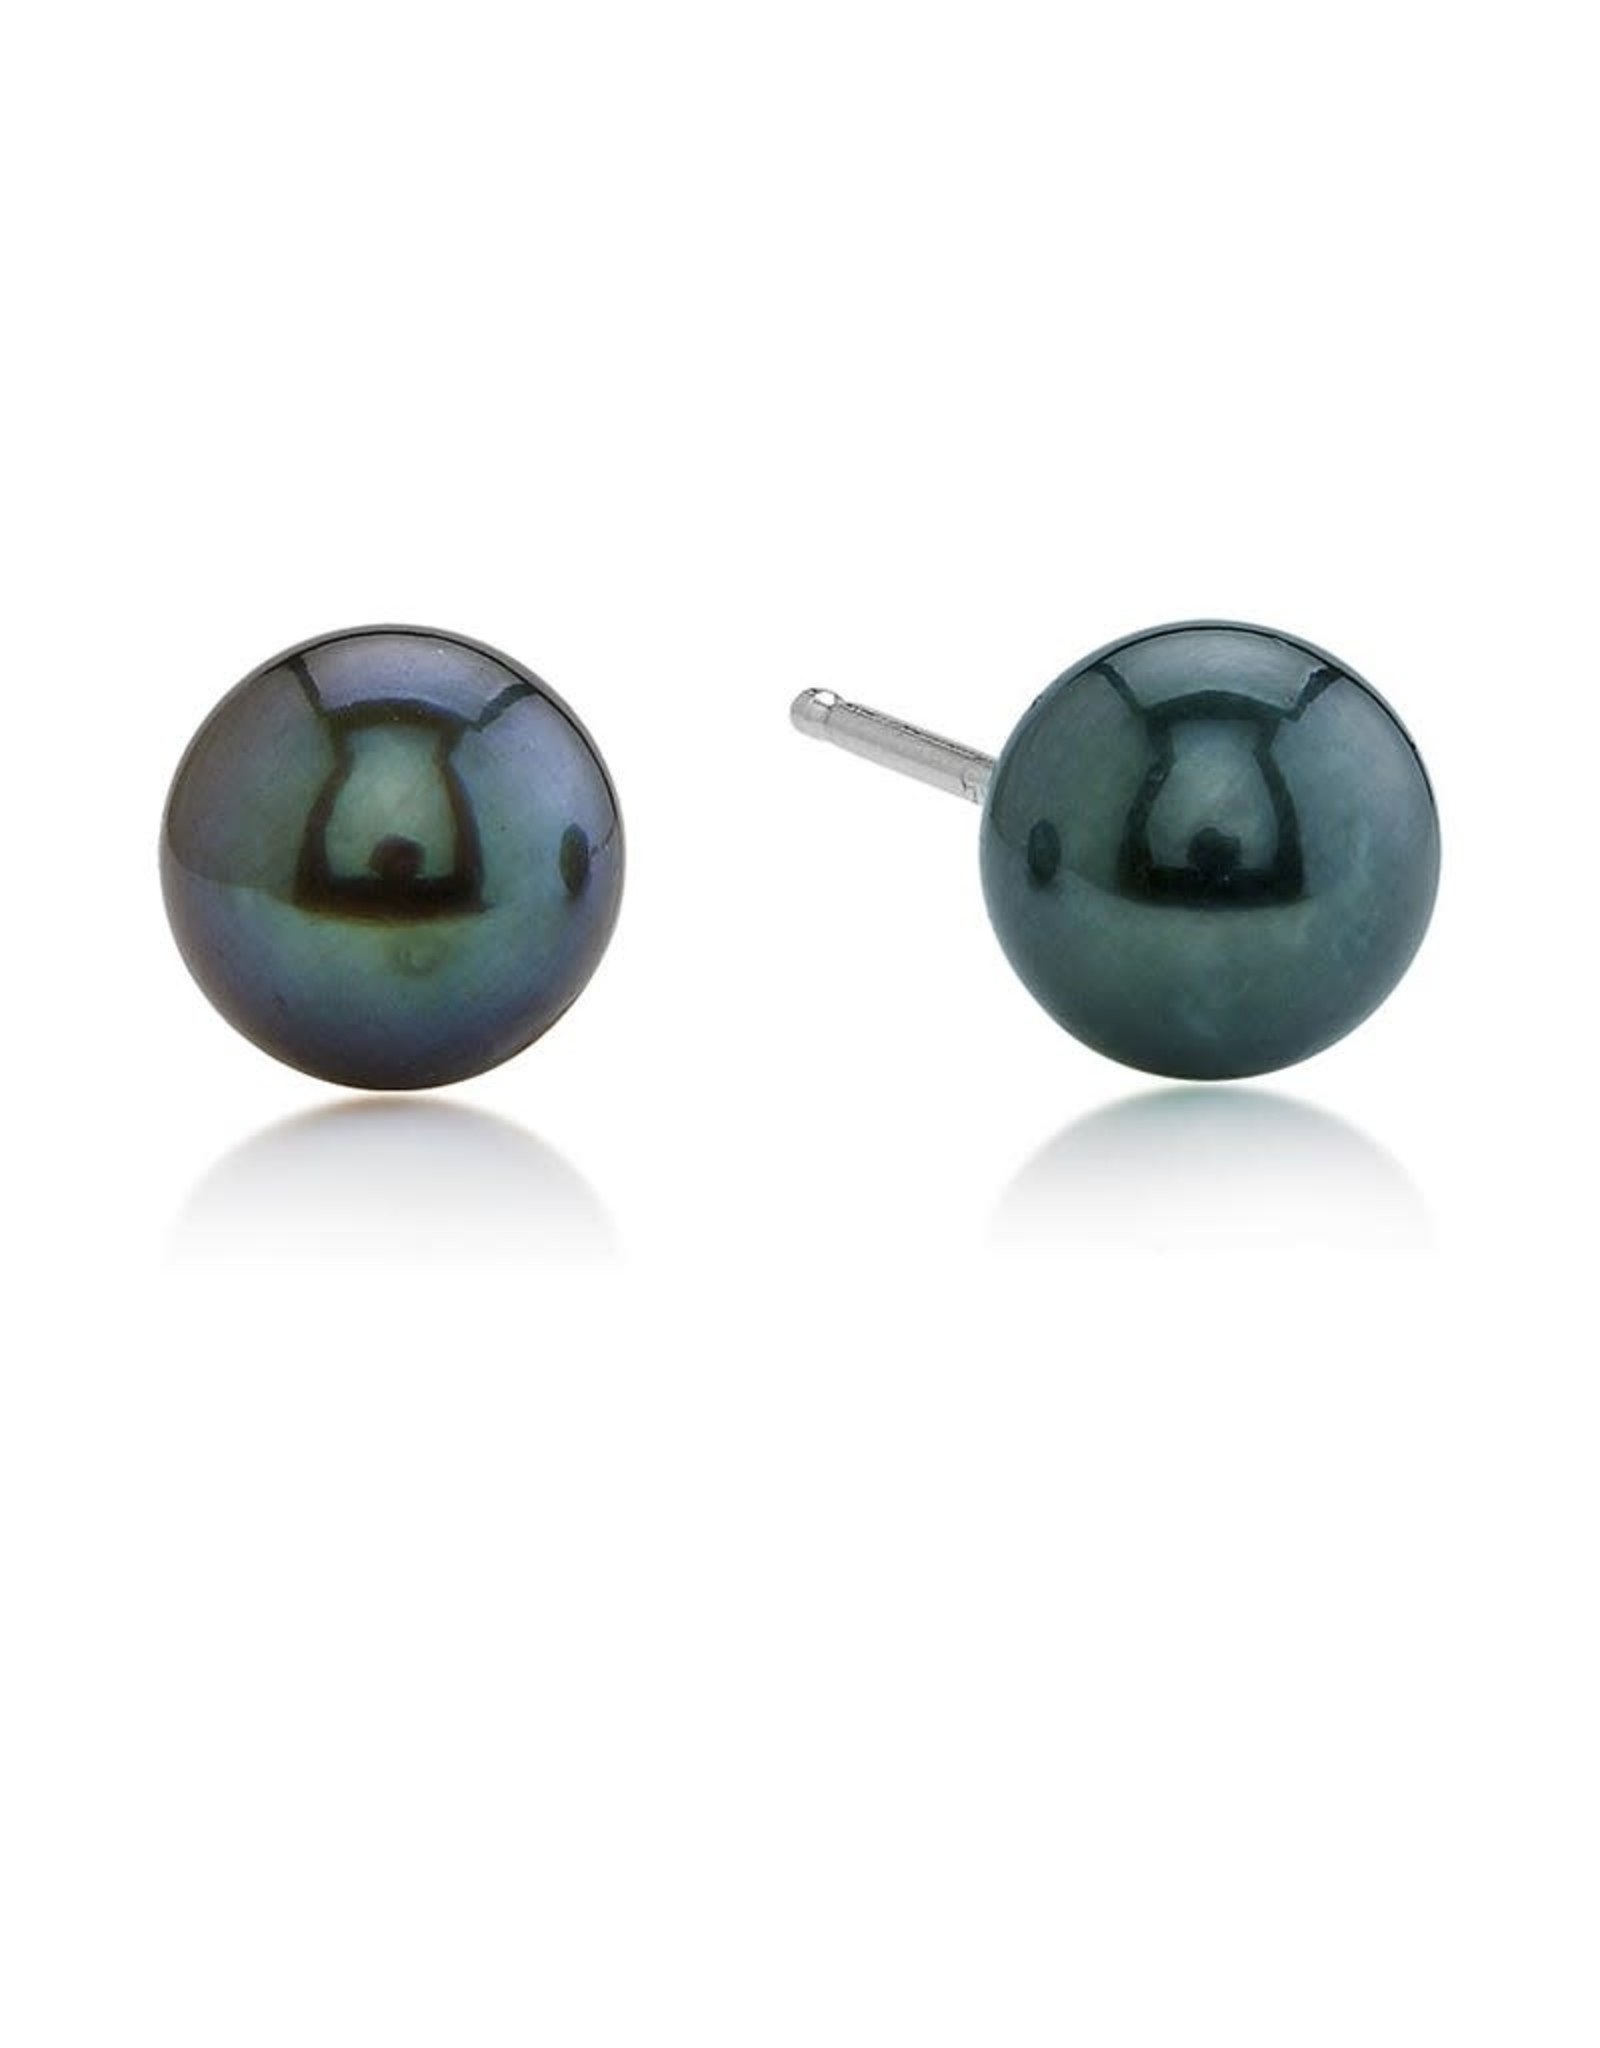 14K White Gold 8mm Black Pearl Stud Earrings